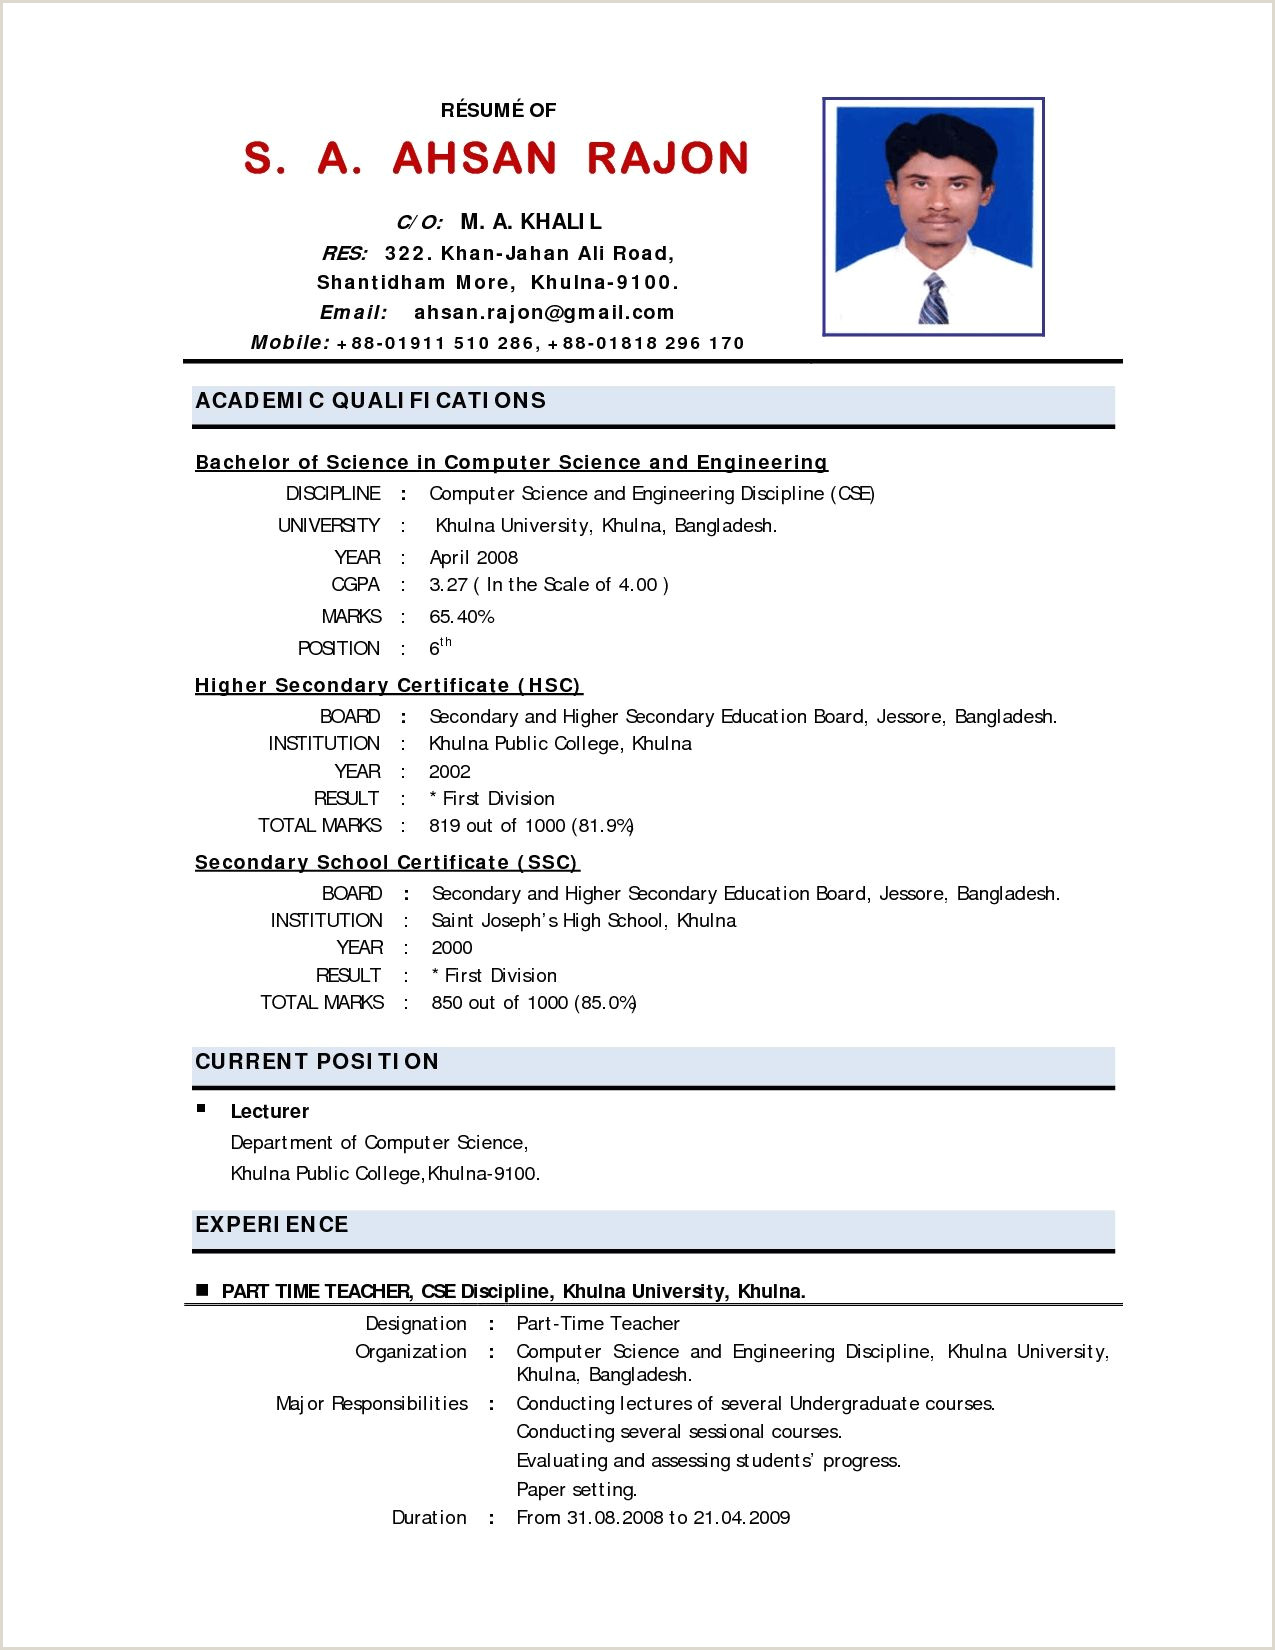 Cv format for Job In Bangladesh Pdf Download Pin On Standard Cv format